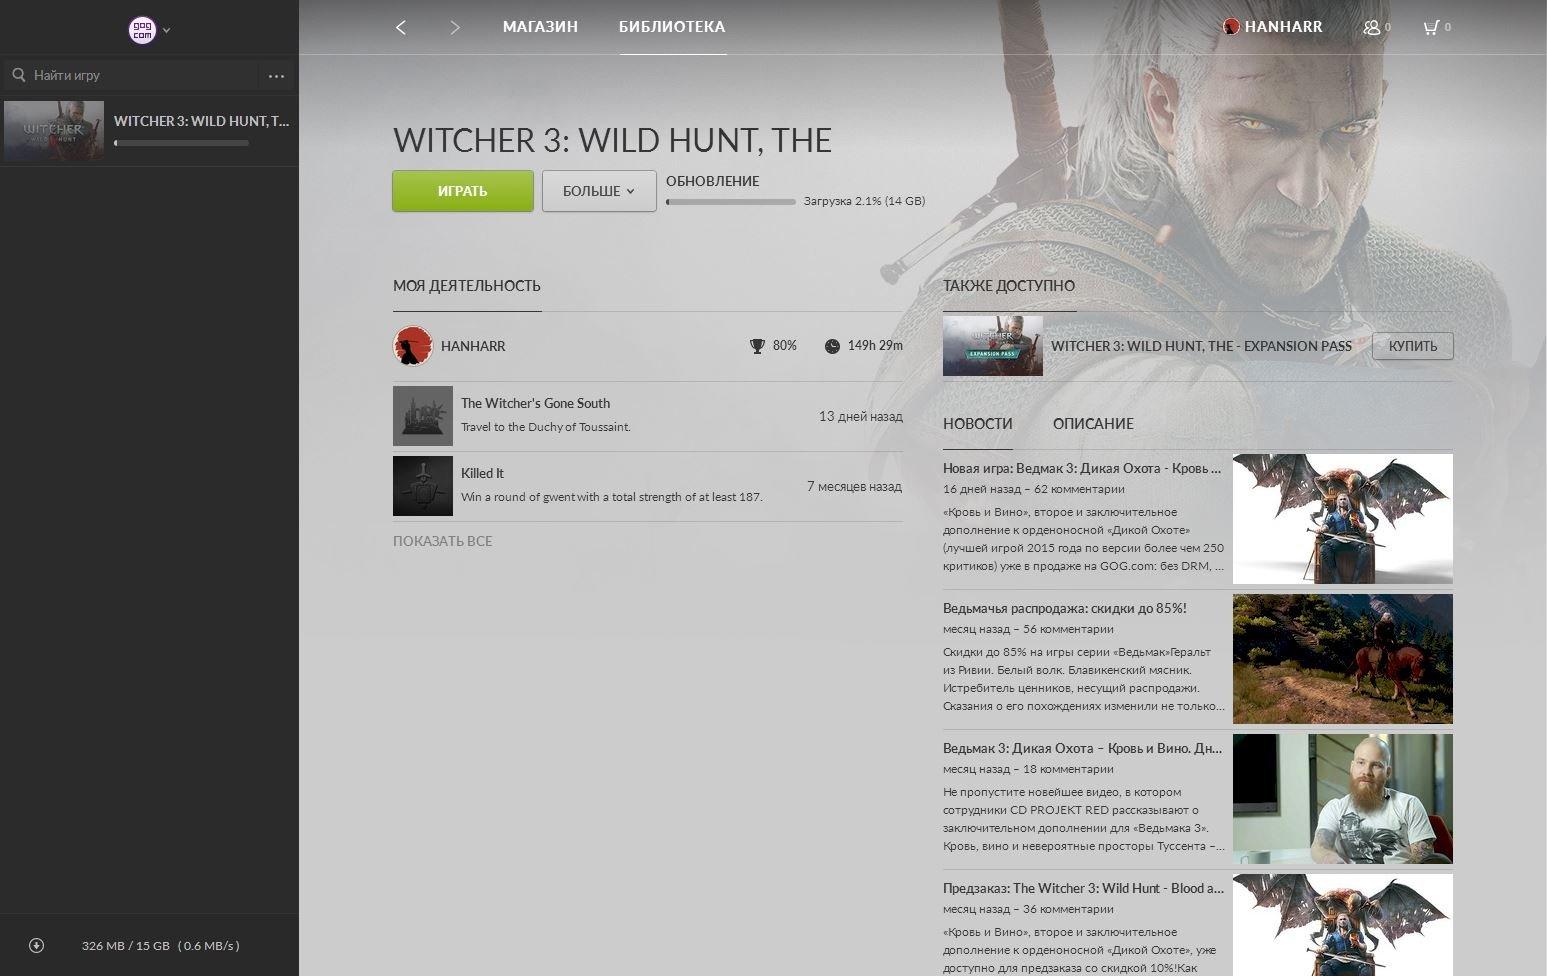 The Witcher 3 1.22 [RU] - Изображение 1